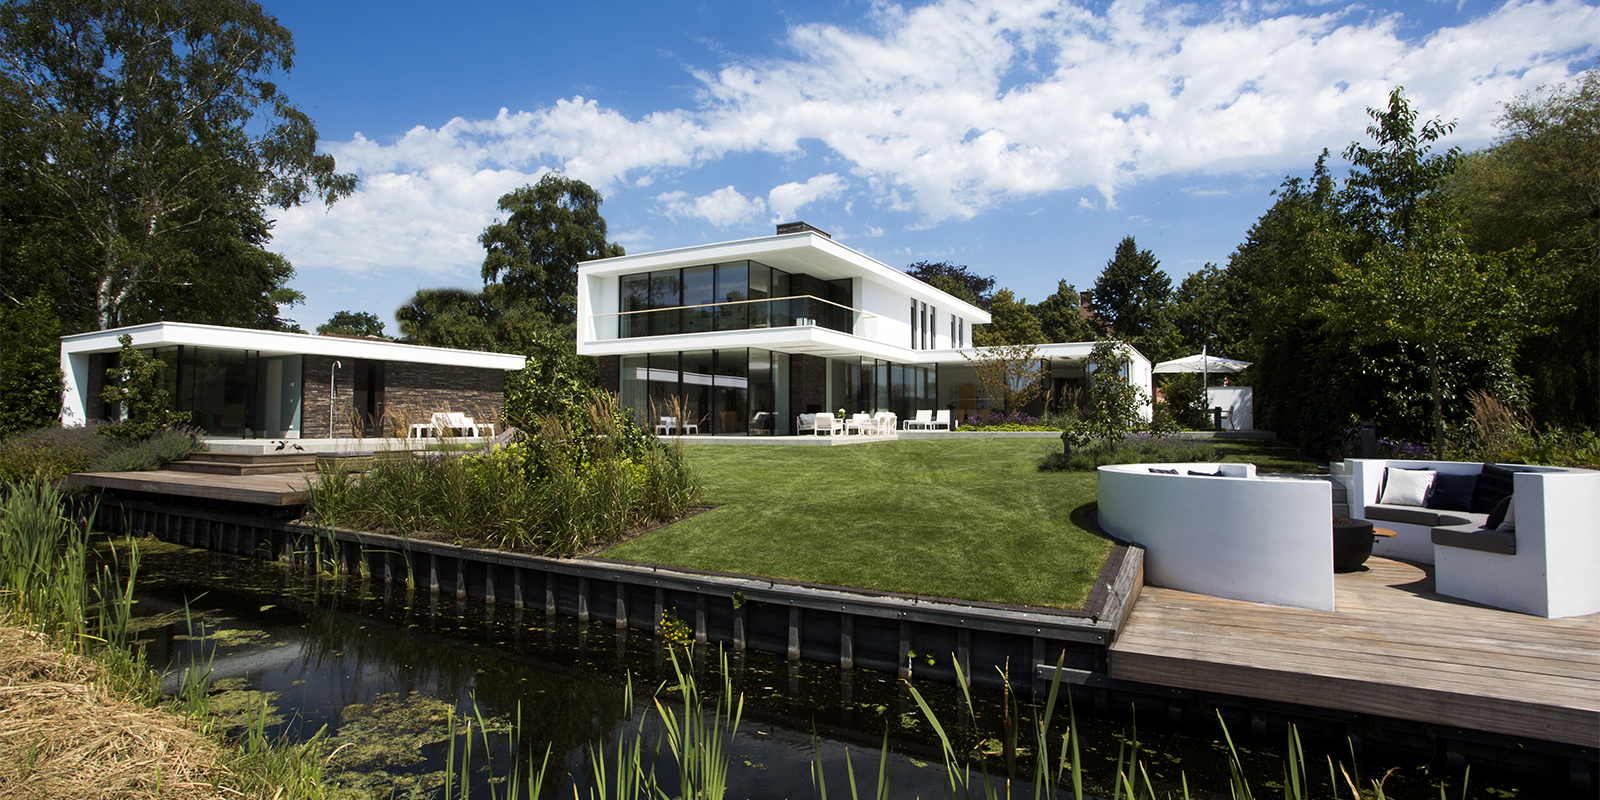 Romantische tuin, Ludo Dierckx, Zwembad, Poolhouse, Openheid, Terras, Overkapping, Lounge, Tuin, Exterieur